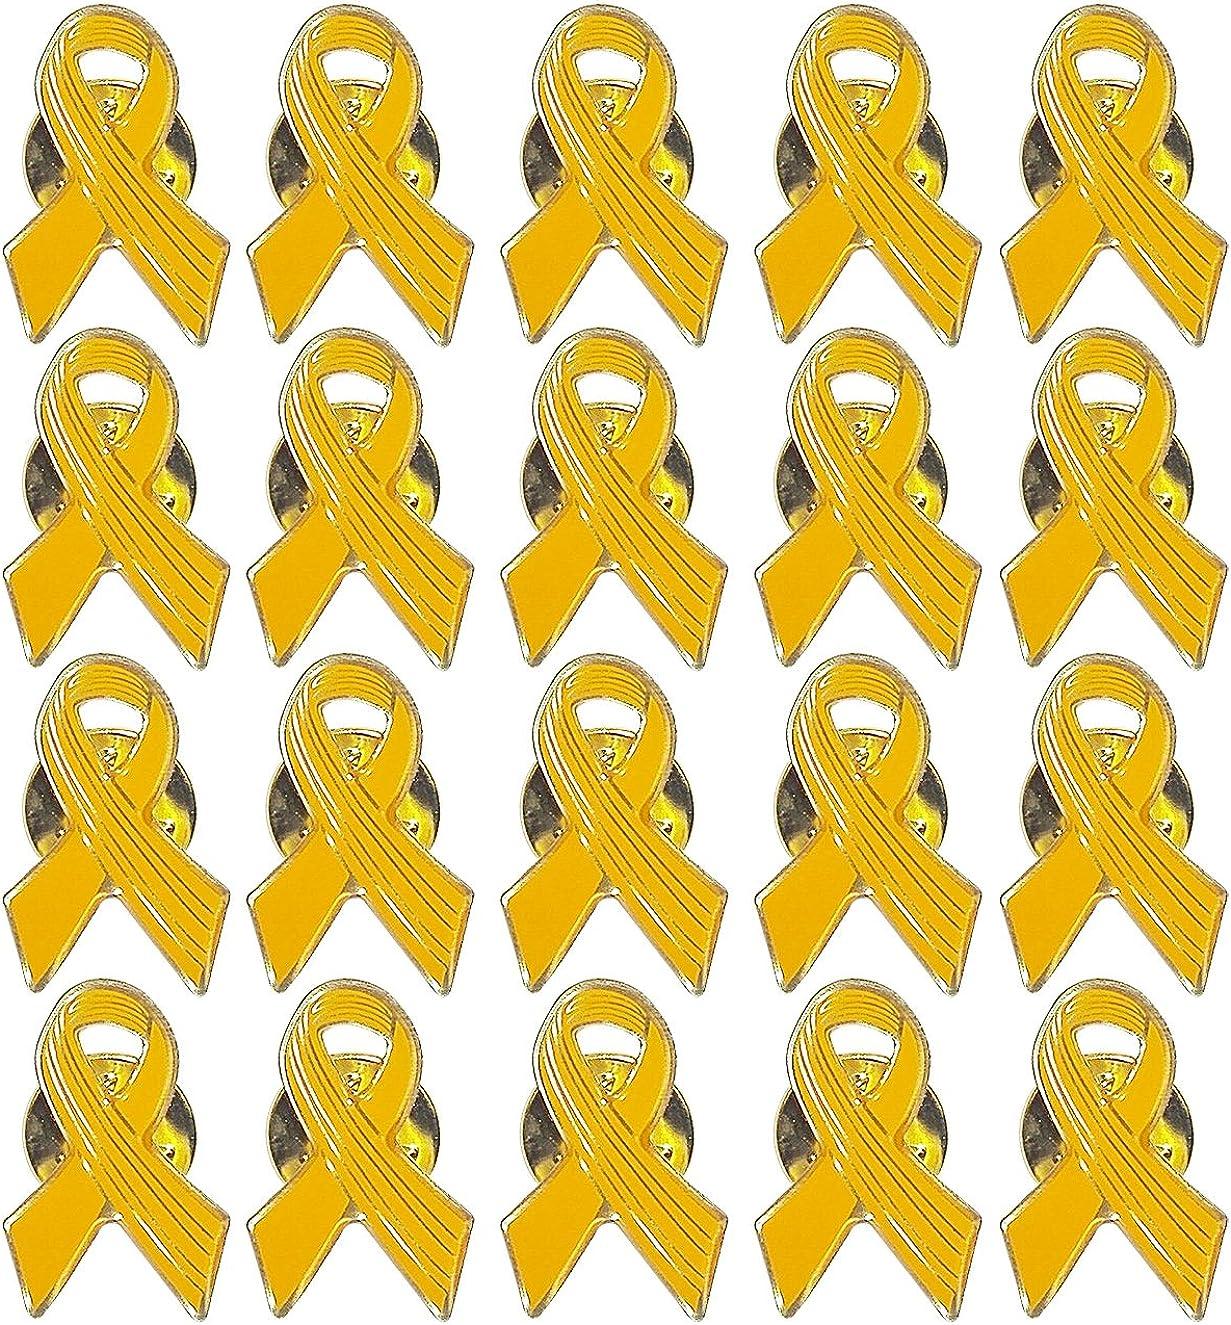 Lot of 20 - Yellow Awareness Ribbon Lapel Pins - Enamel On Gold Tone Metal.